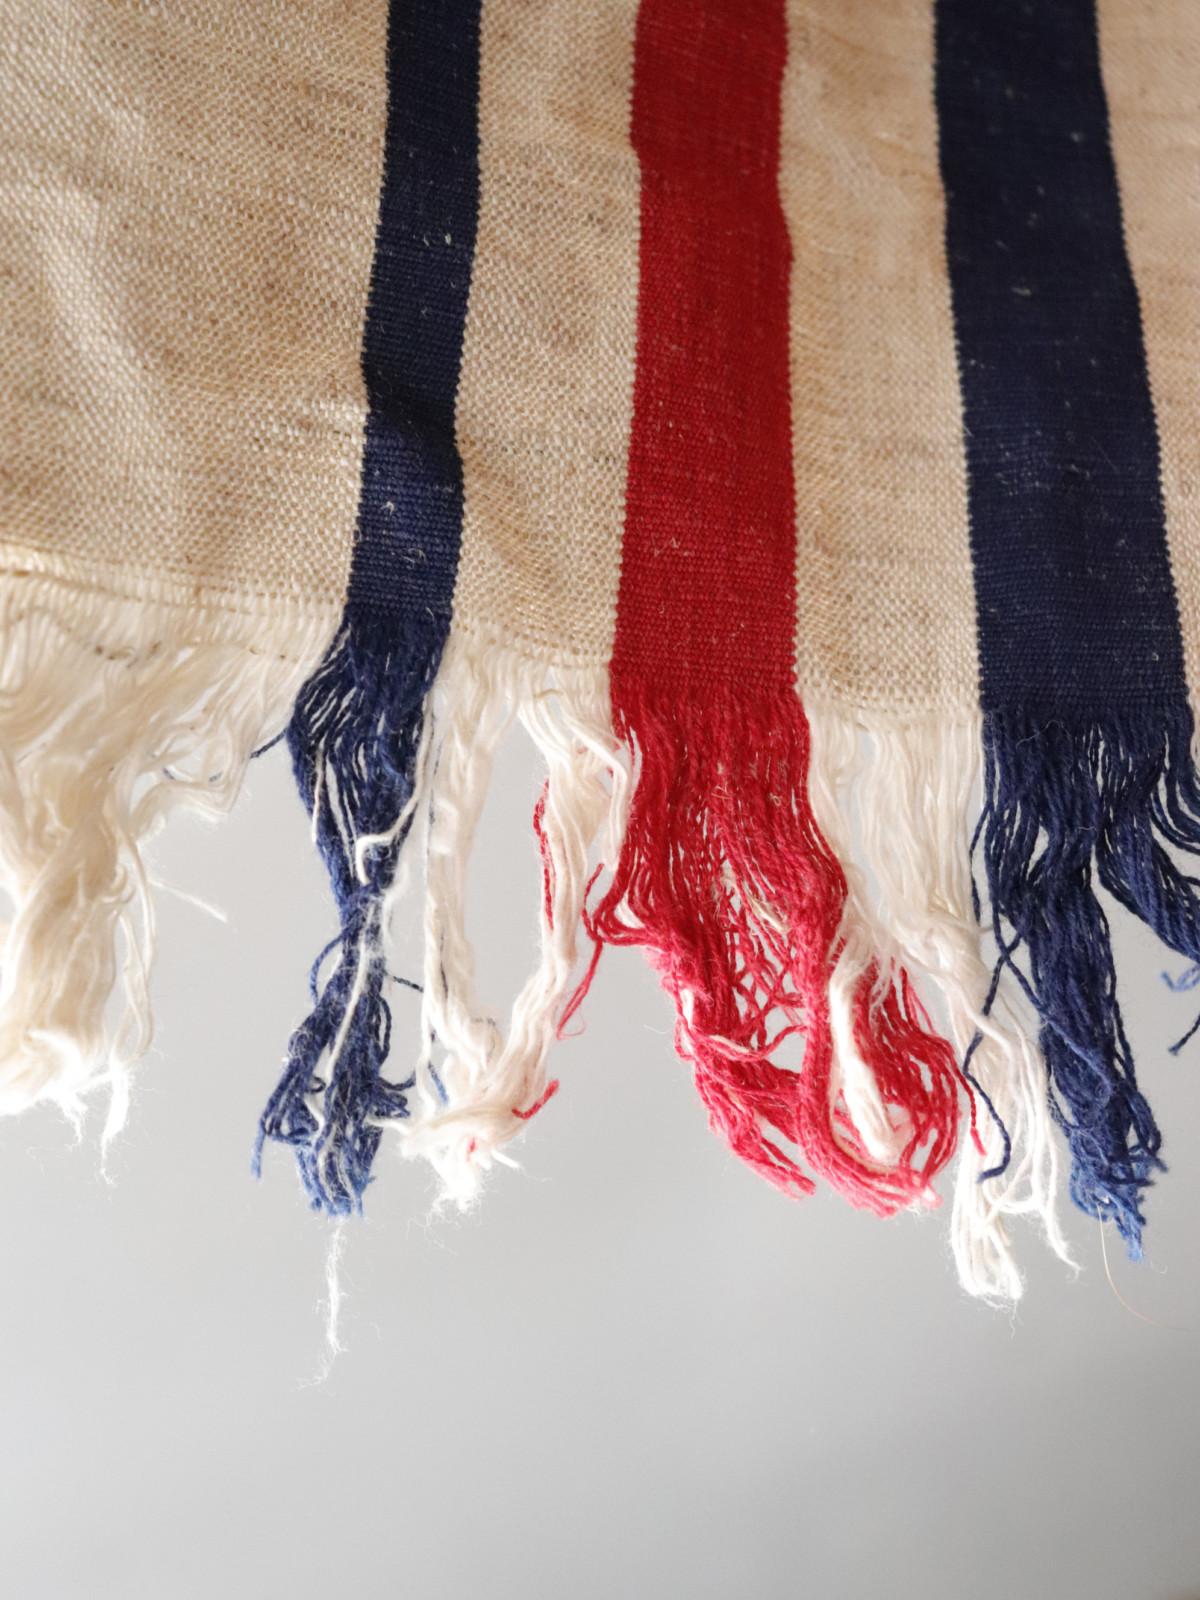 Dead stock,cotton x linen,europe,fabric